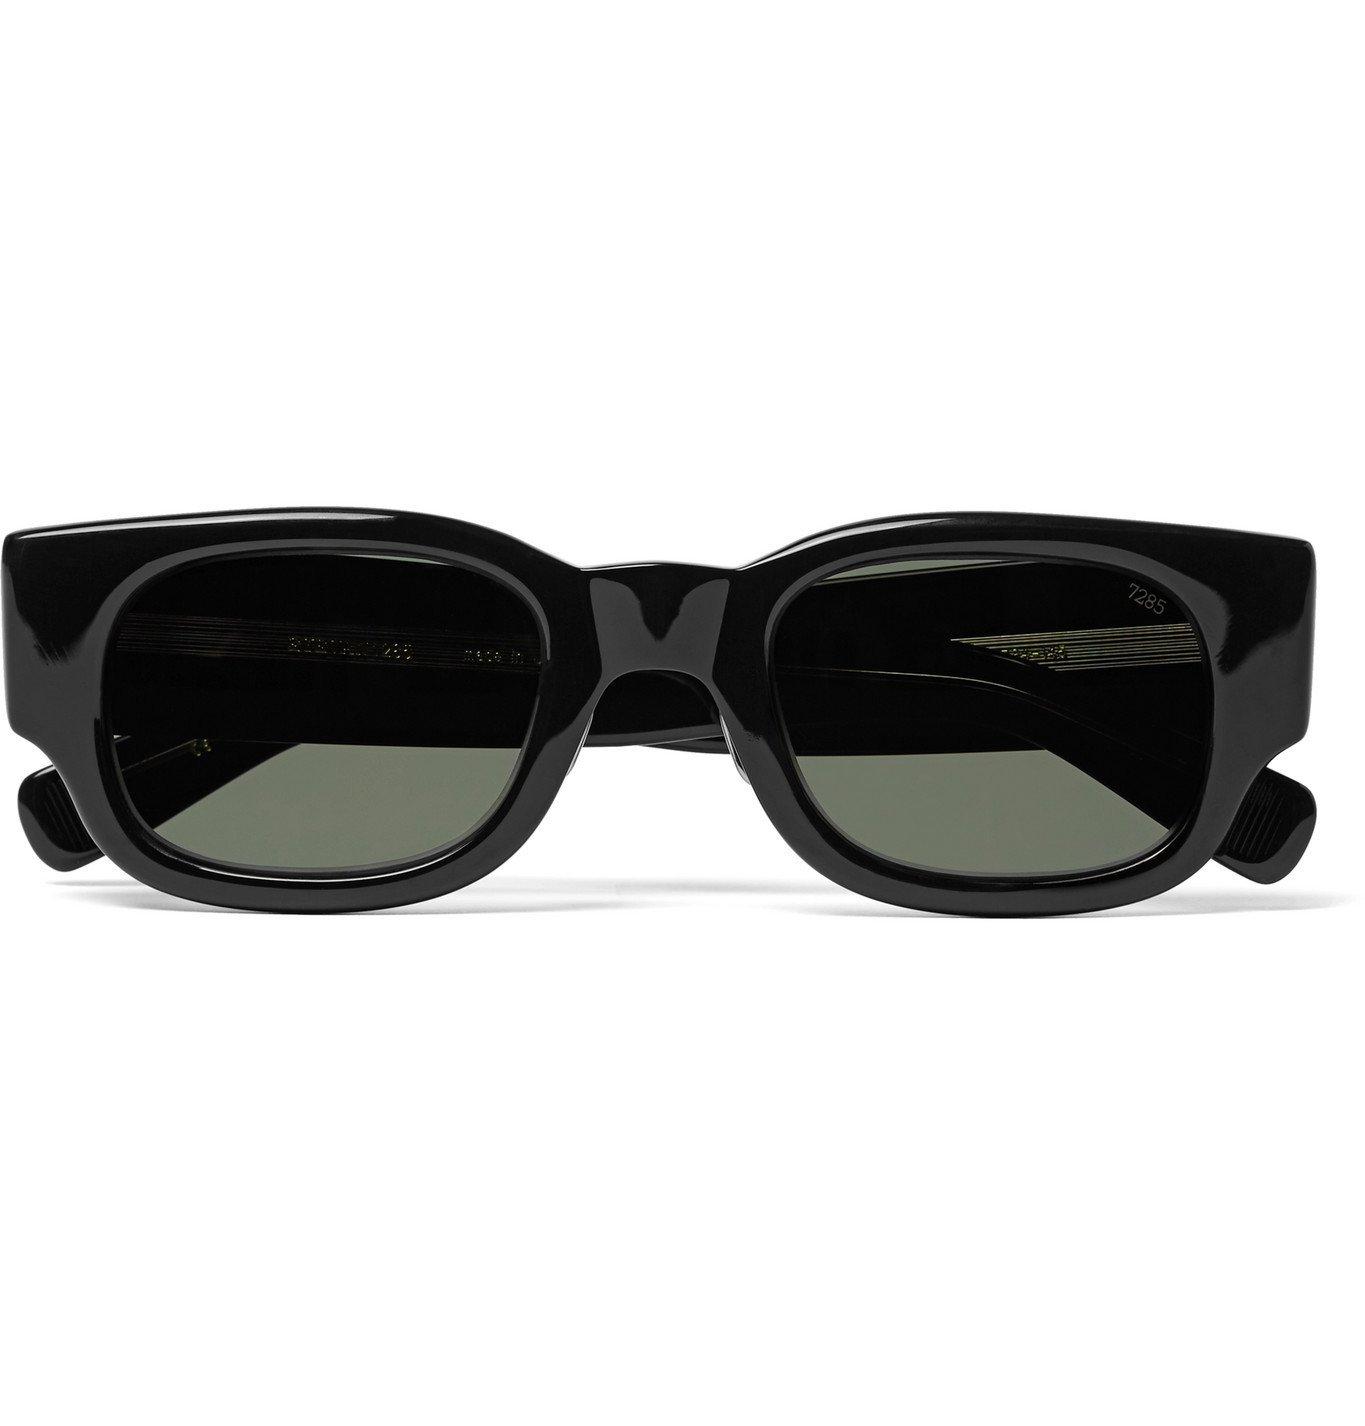 Photo: Eyevan 7285 - Square-Frame Acetate Sunglasses - Black